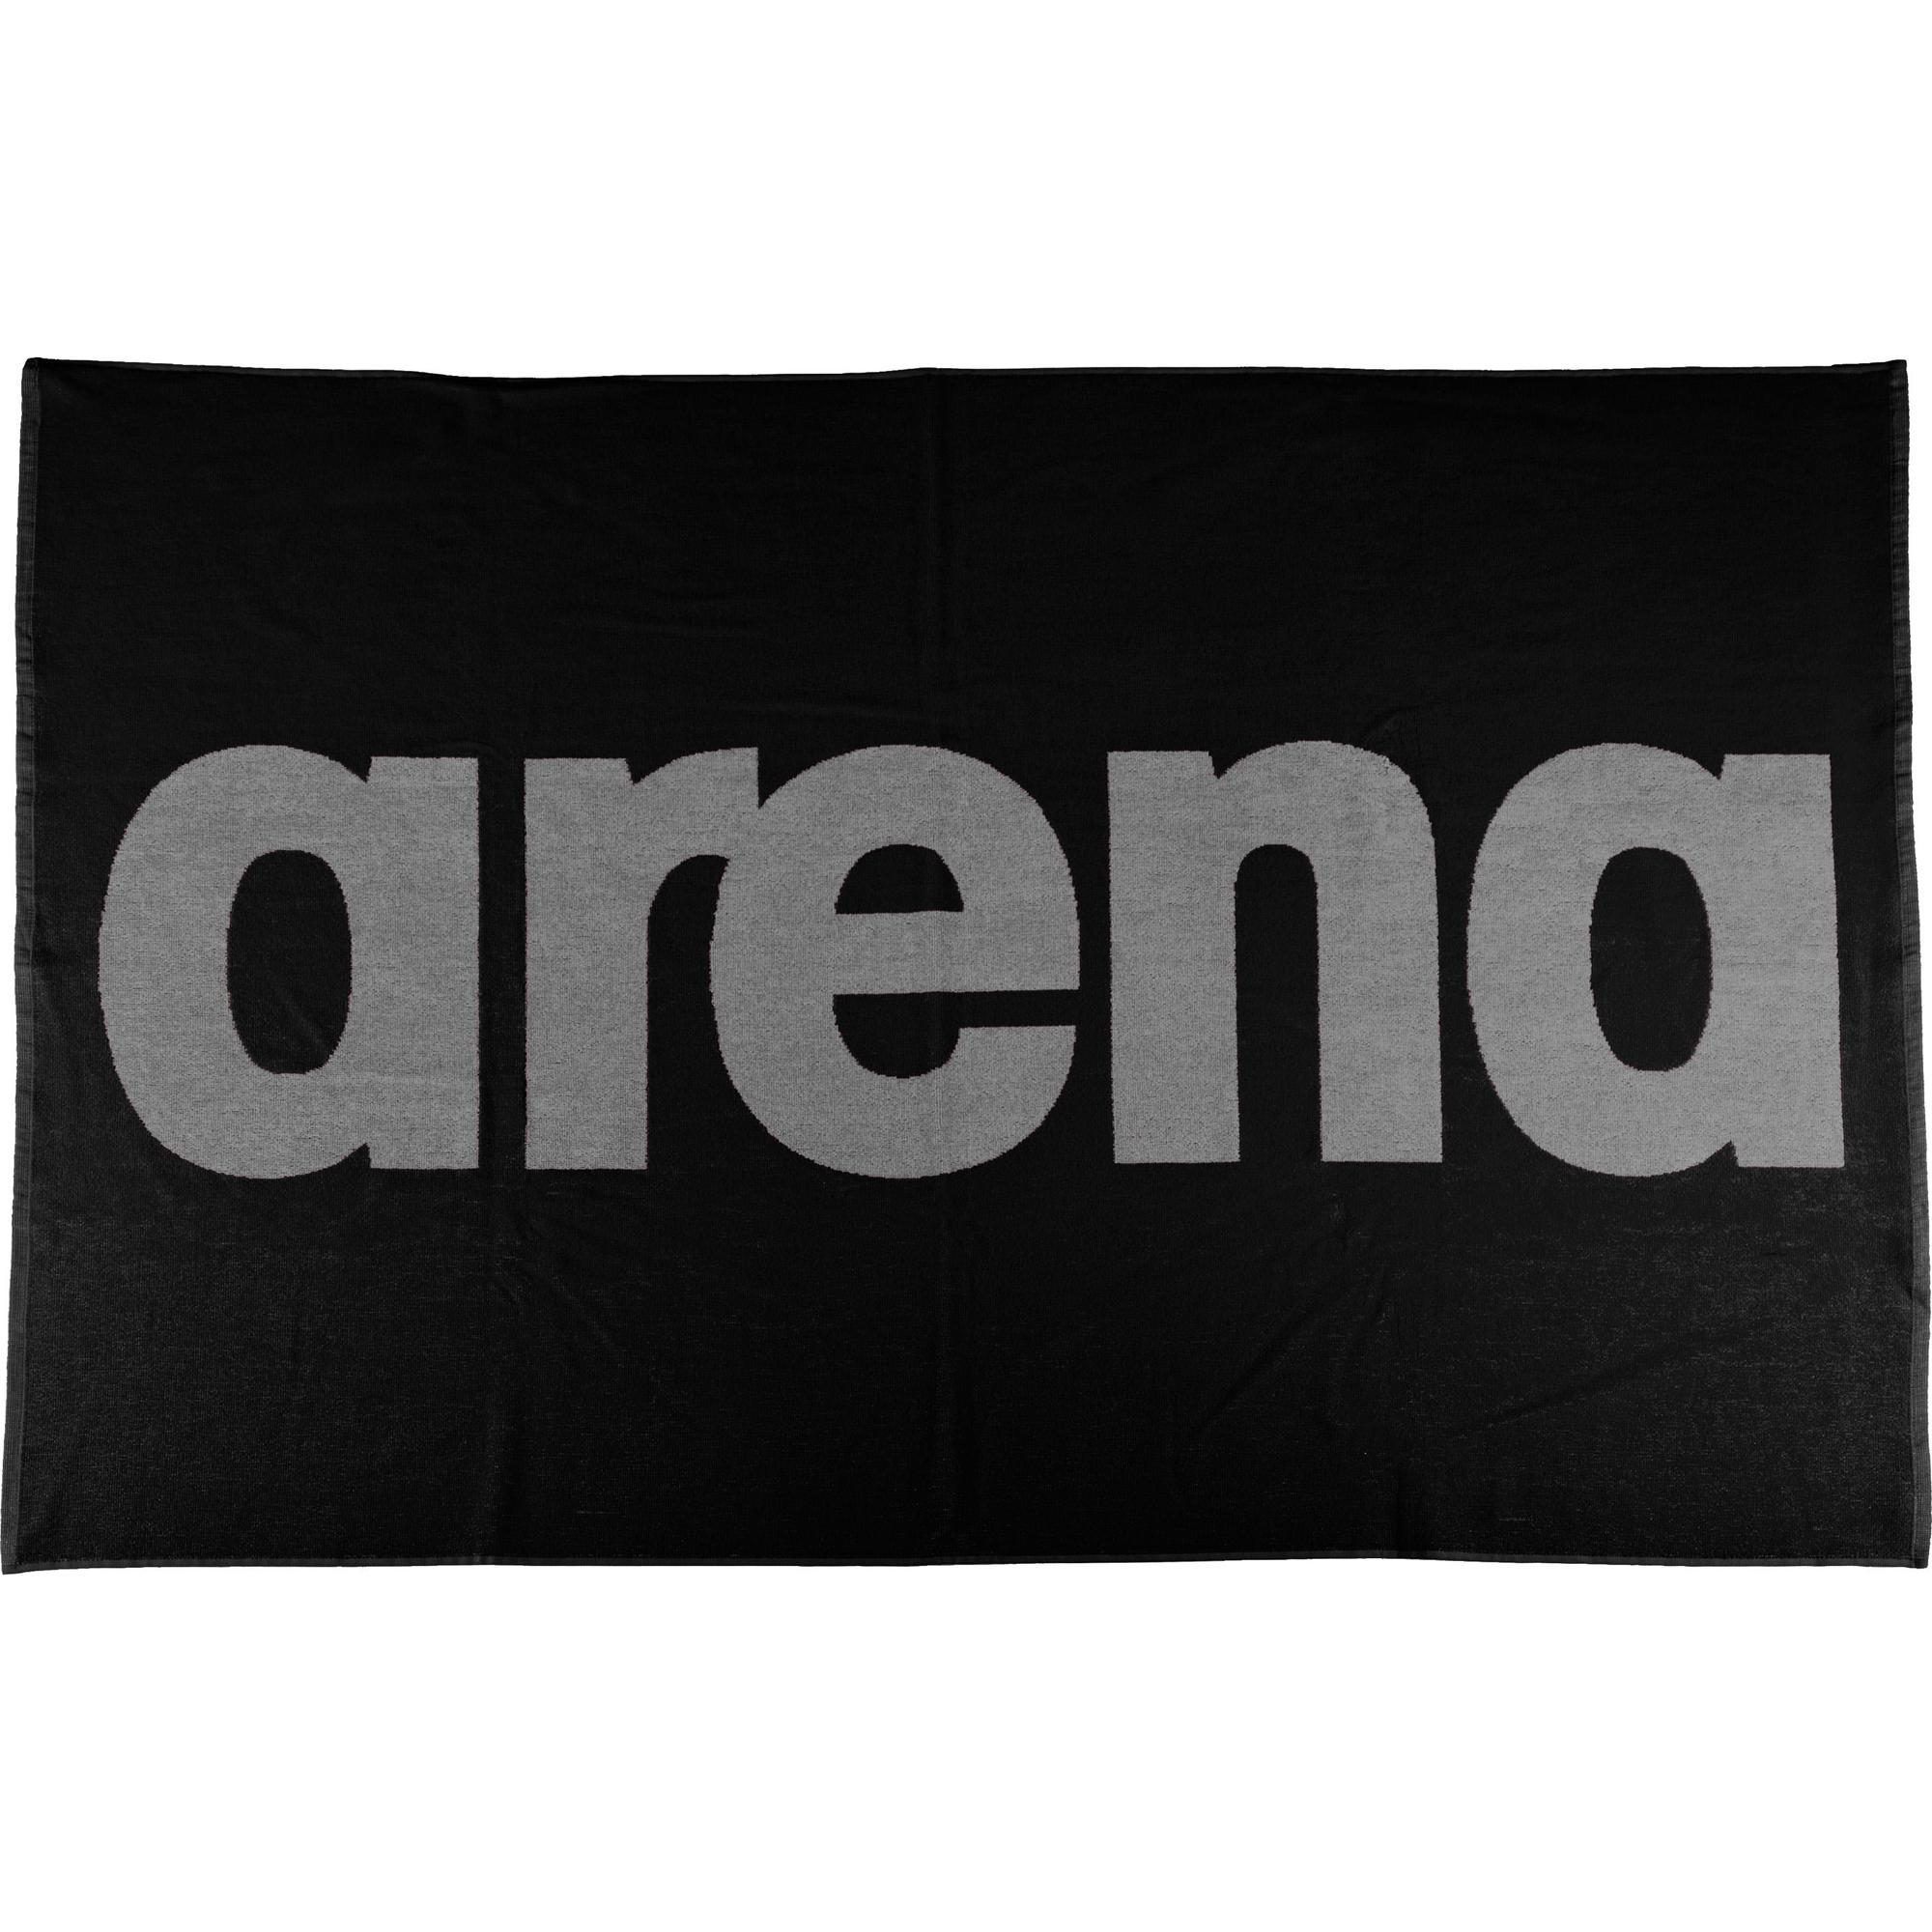 Arena Handtuch groß Handy 2A490-55